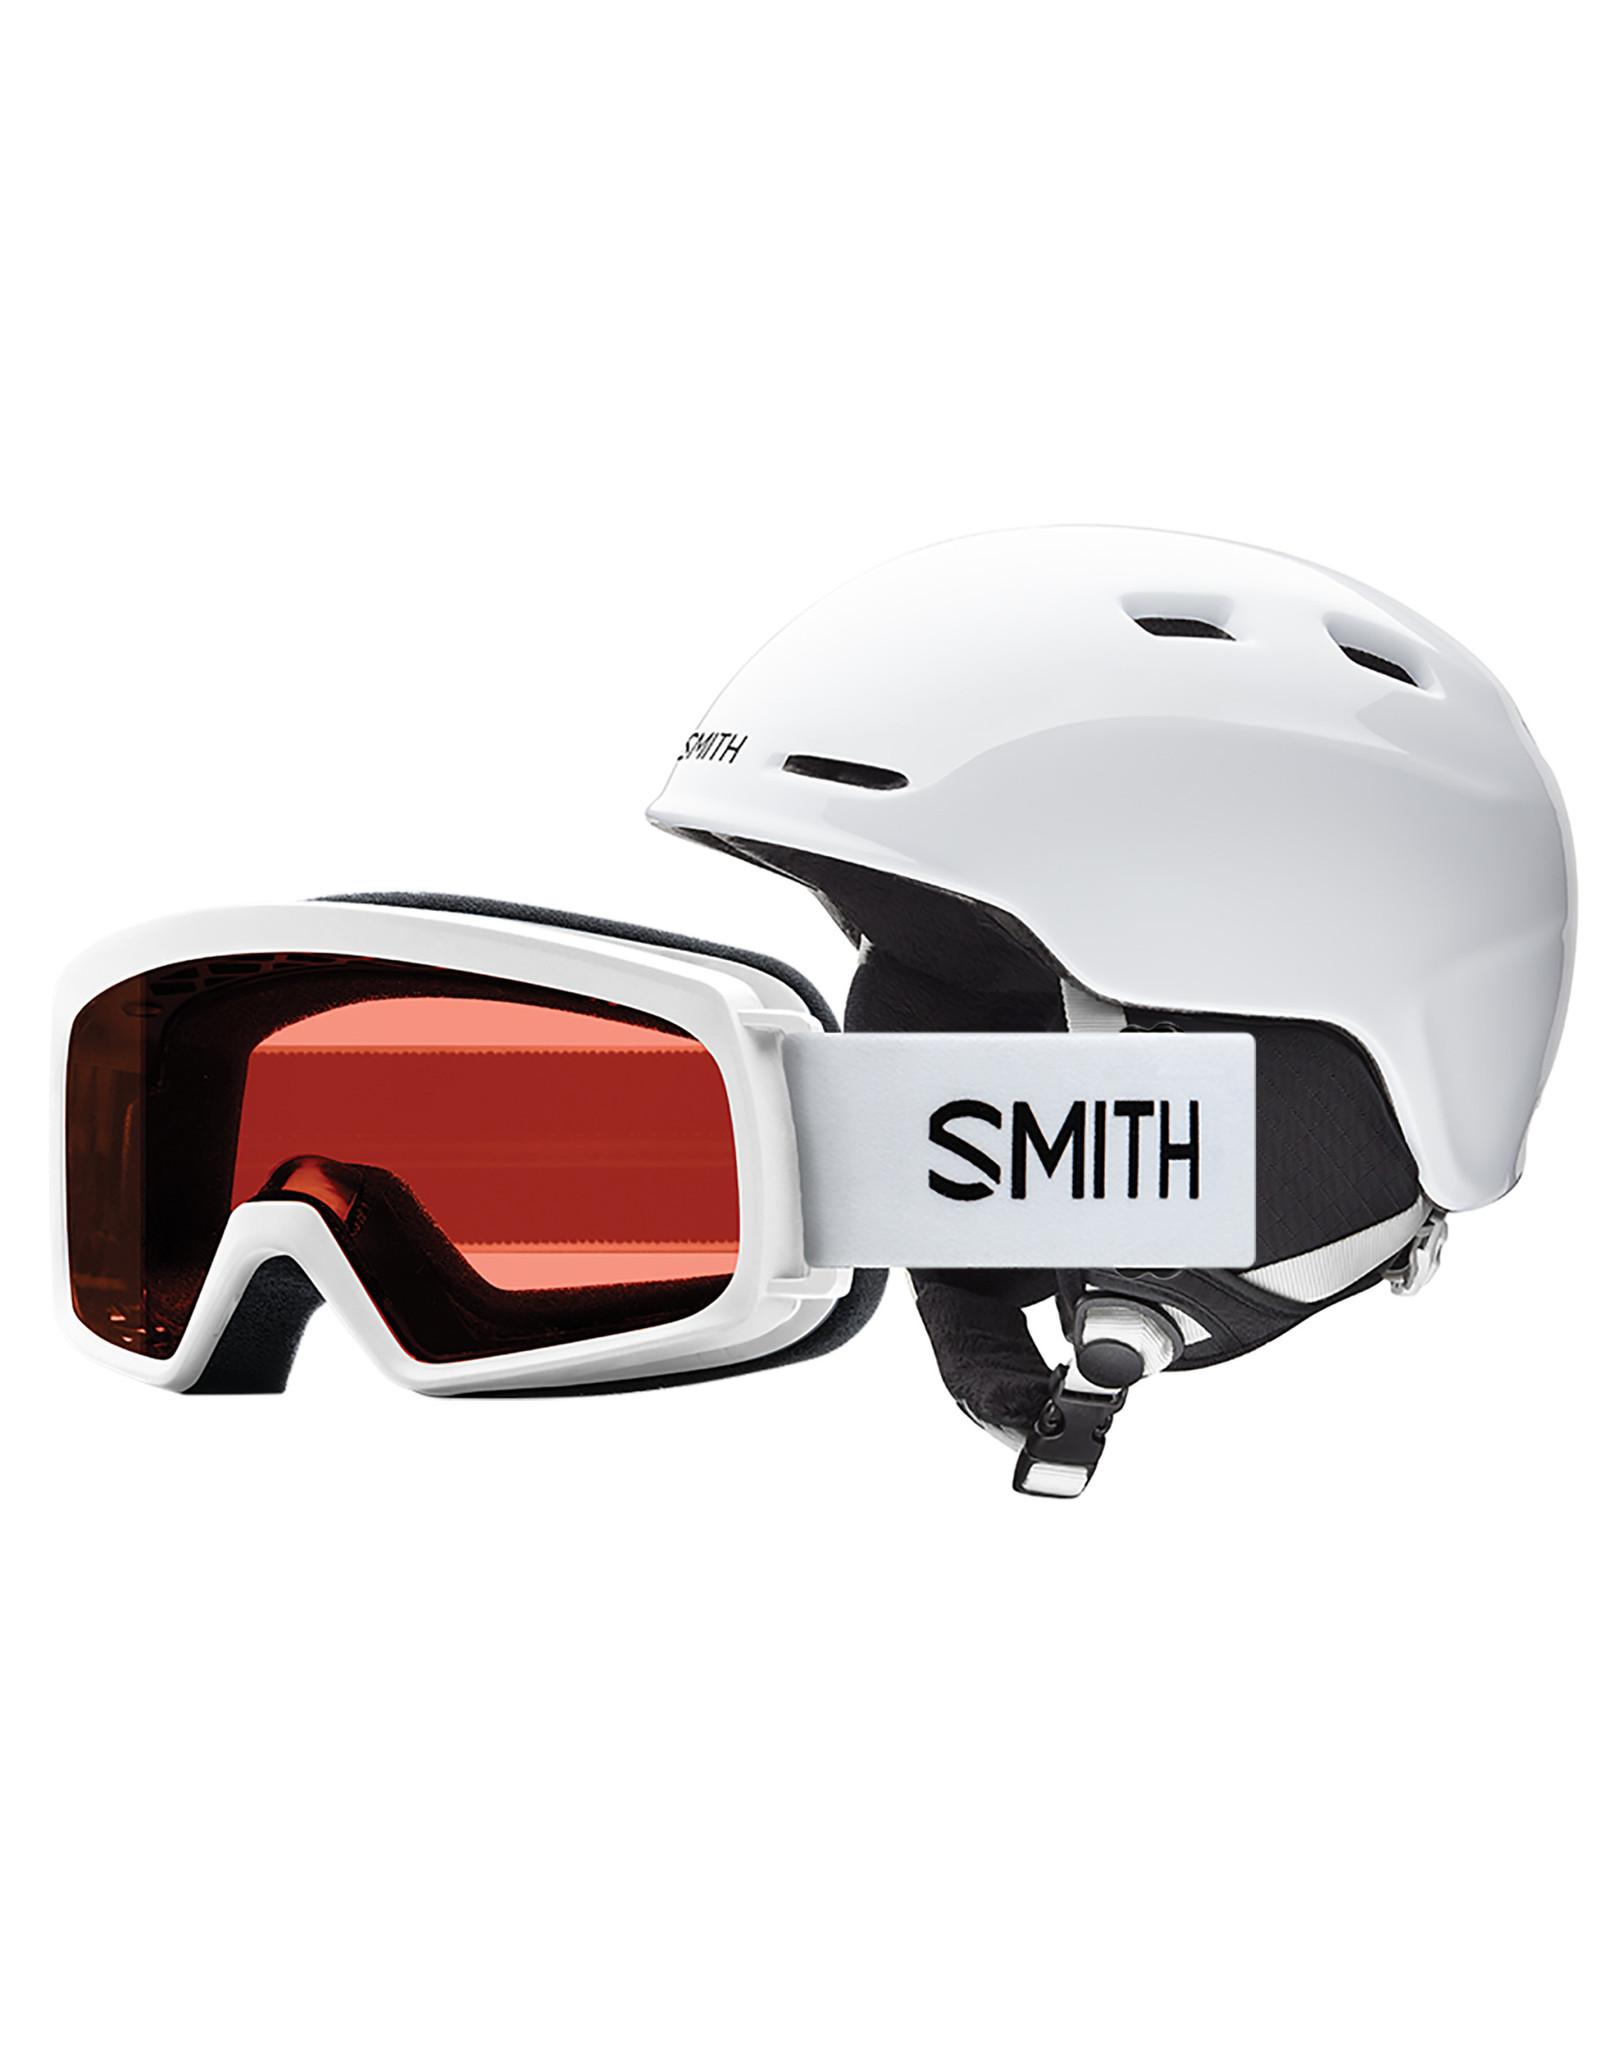 Smith SMITH ZOOM JR RASCAL COMBO WHITE 20 LUNETTE & CASQUE